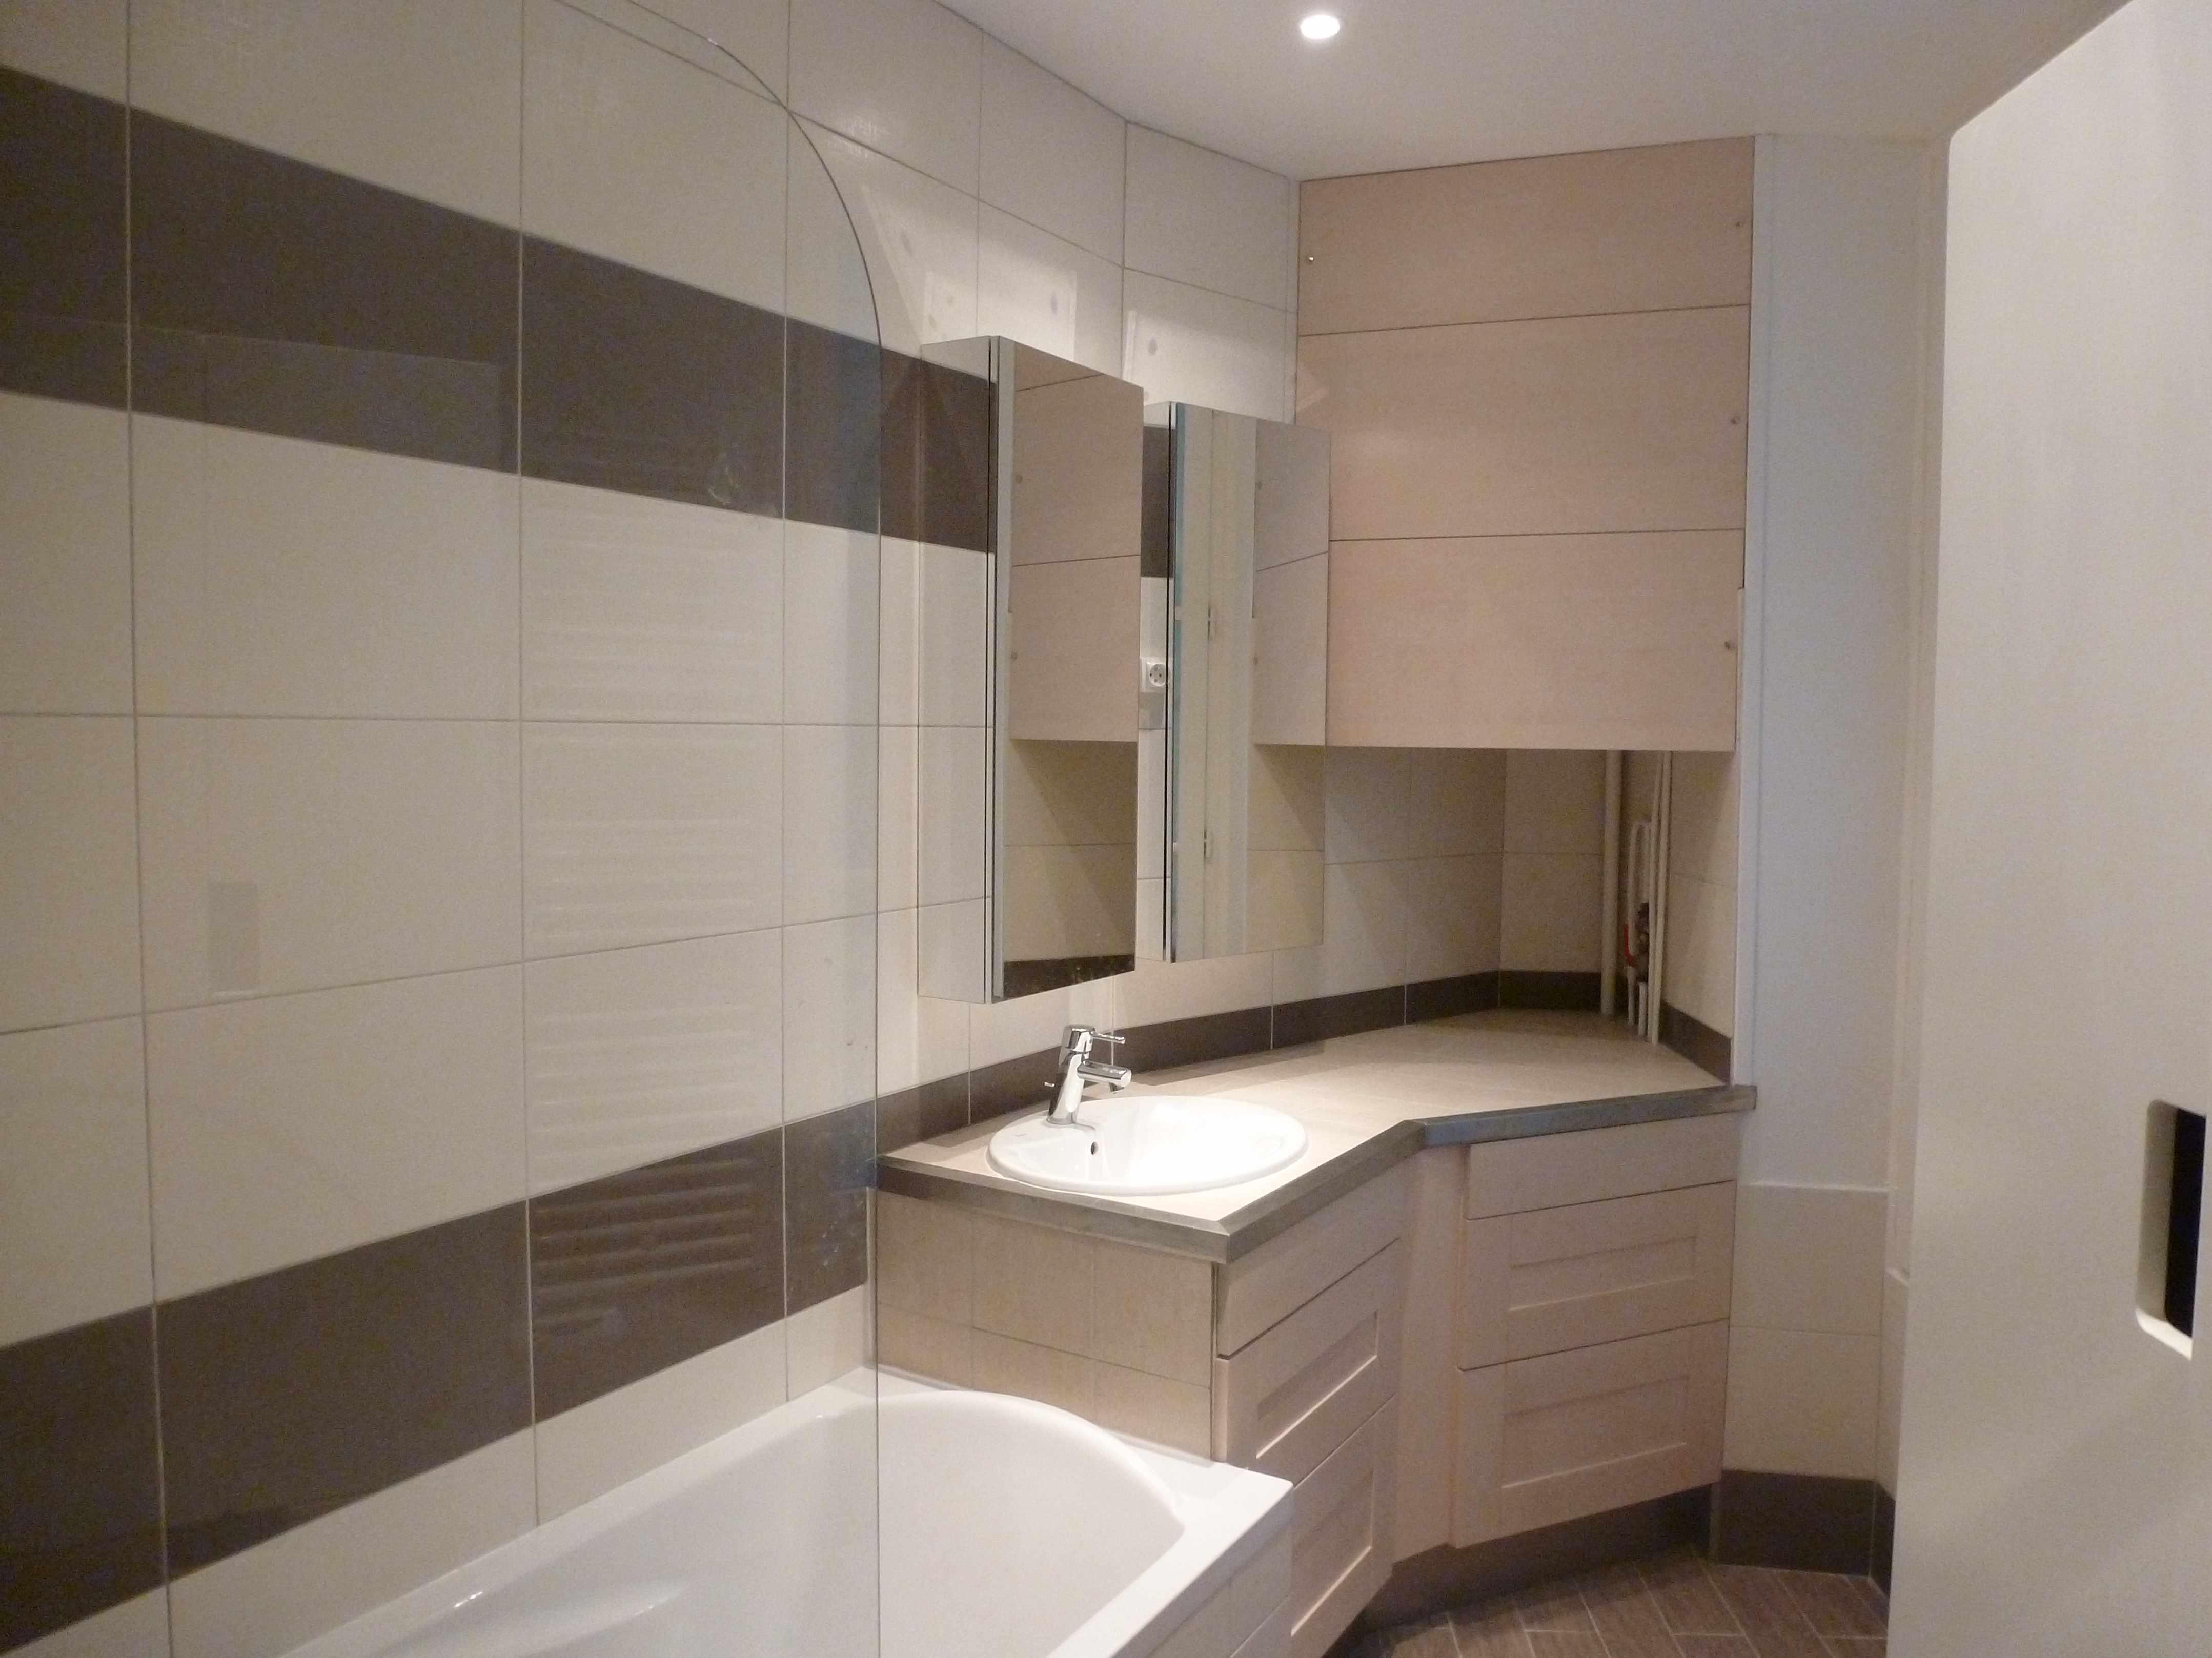 1 an, 3 salles de bain (2) : brun et blanc - Calepinage Salle De Bain